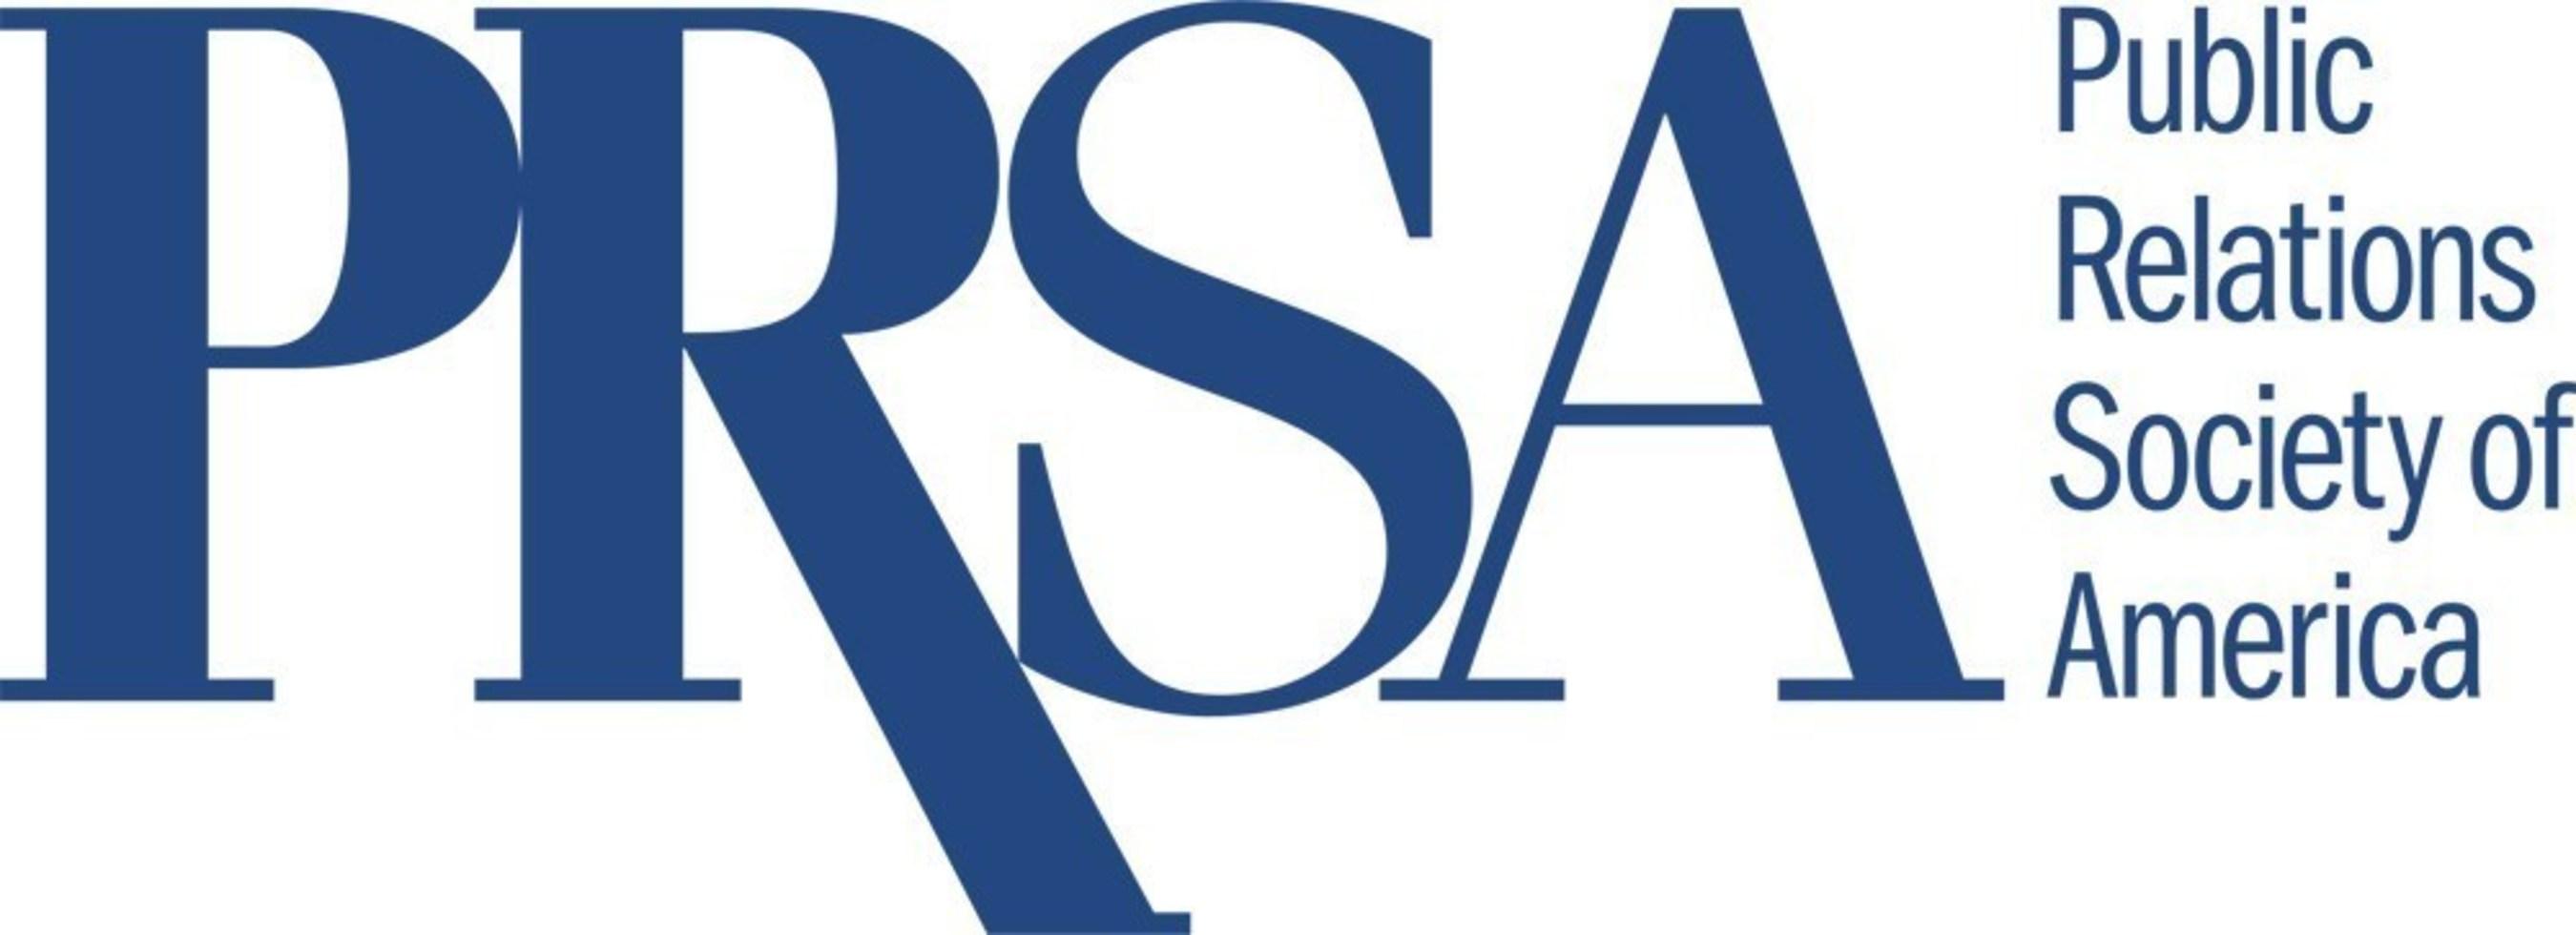 The Public Relations Society of America (PRSA)